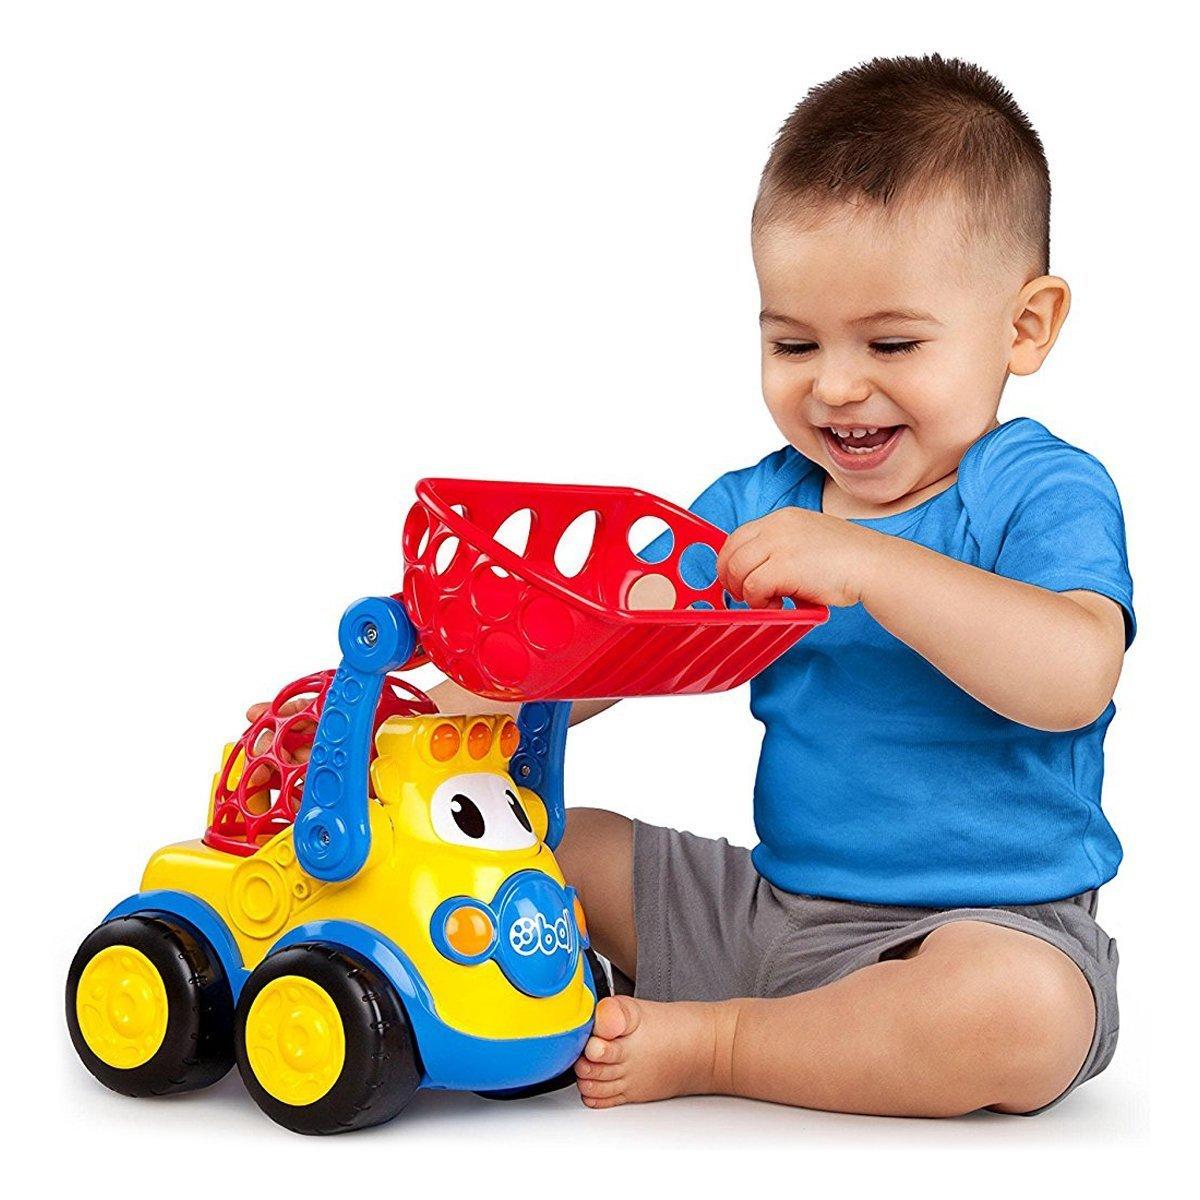 Купить Авто - мото, Машинка Bright Starts Oball Go Grippers Погрузчик 10313 ТМ: Bright Starts